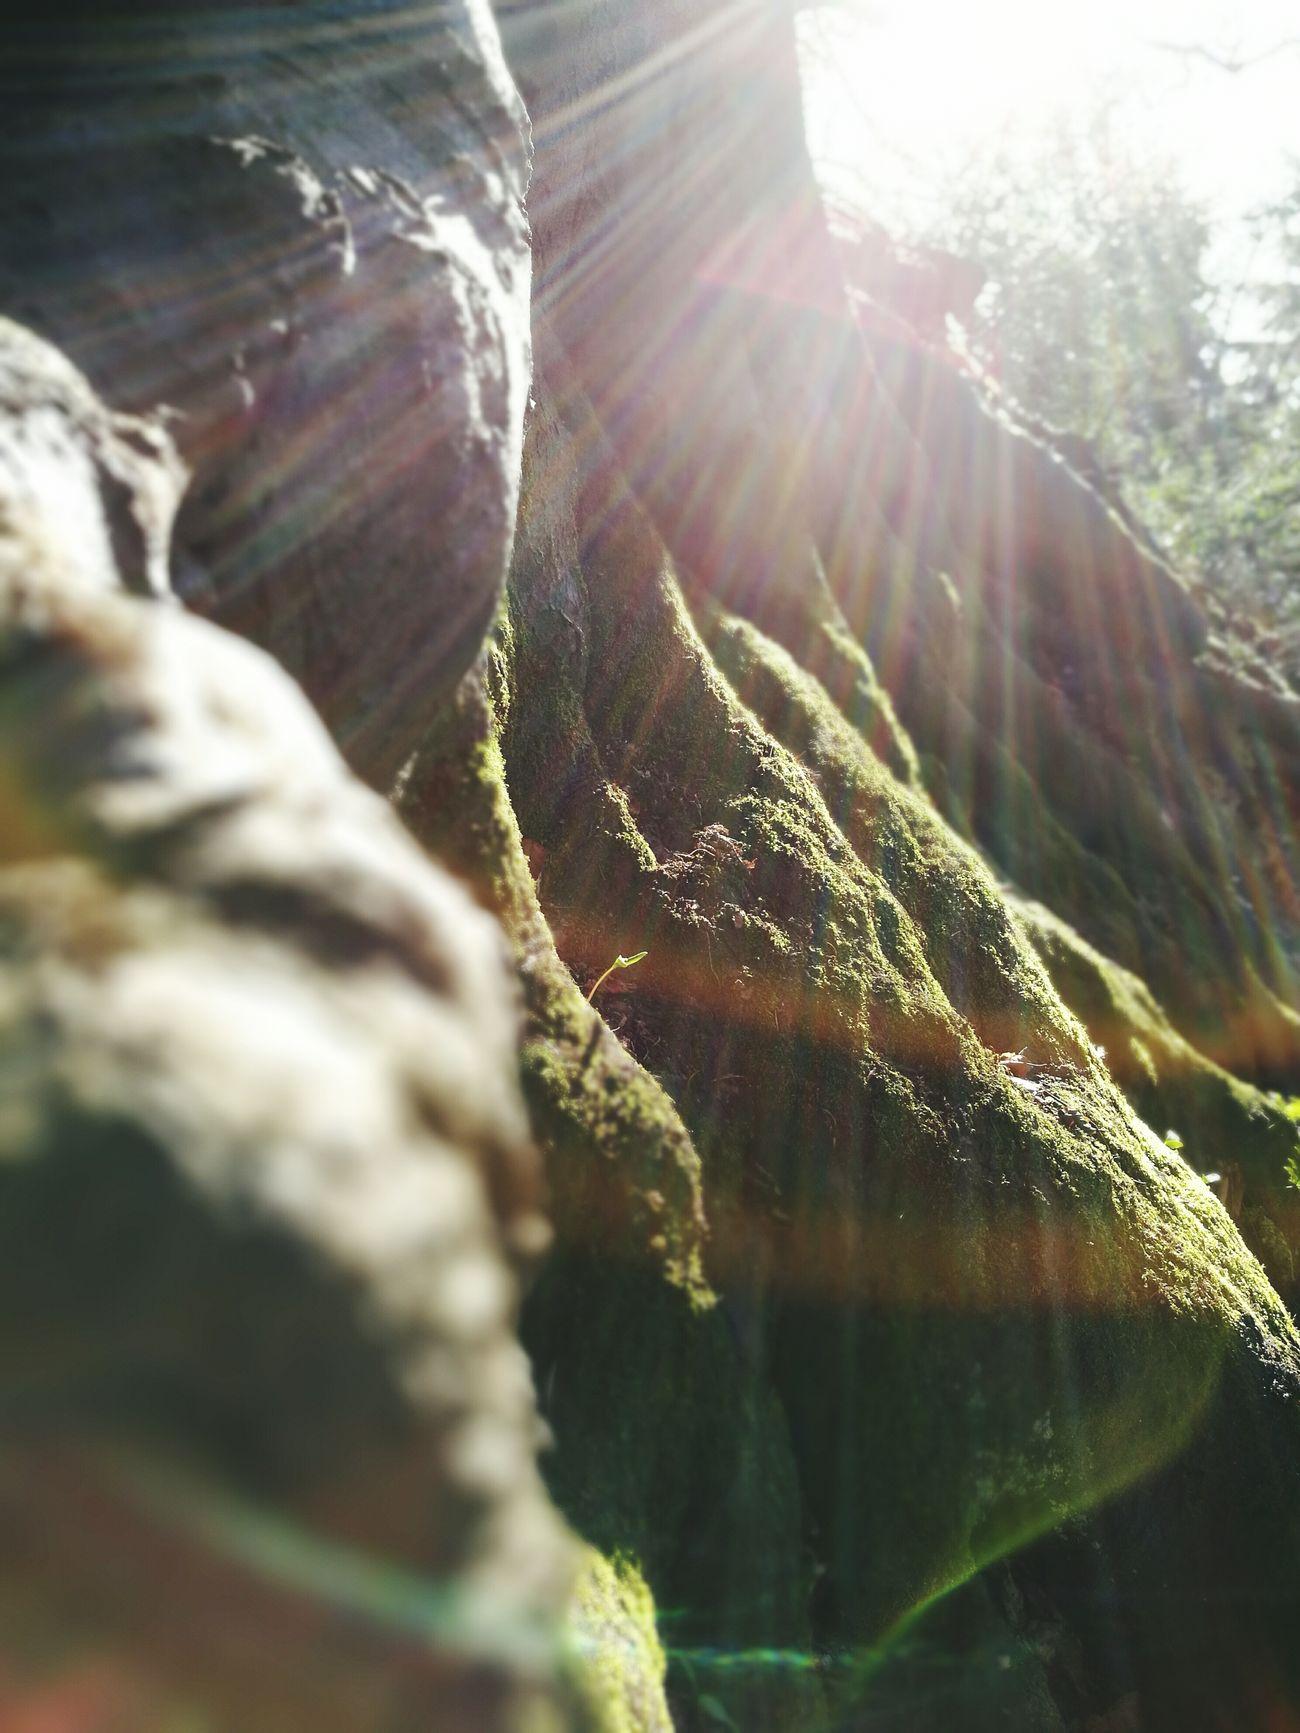 Hanging Out Taking Photos Relaxing Enjoying Life Eye For Photography Nature Huawei P9 Leica Photography Sunlight